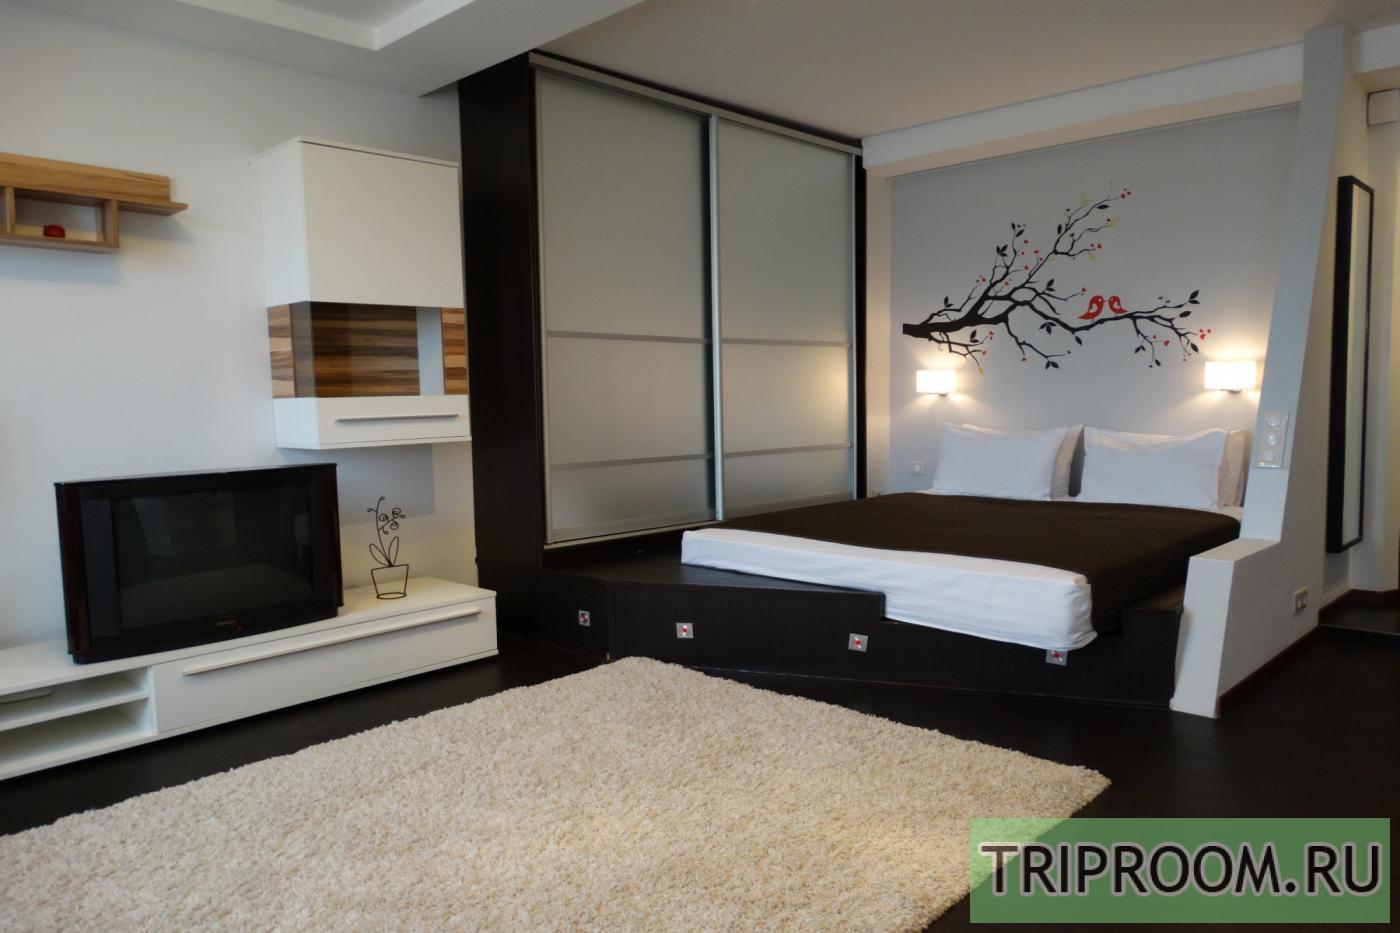 1-комнатная квартира посуточно (вариант № 22157), ул. Архитектора Власова улица, фото № 10